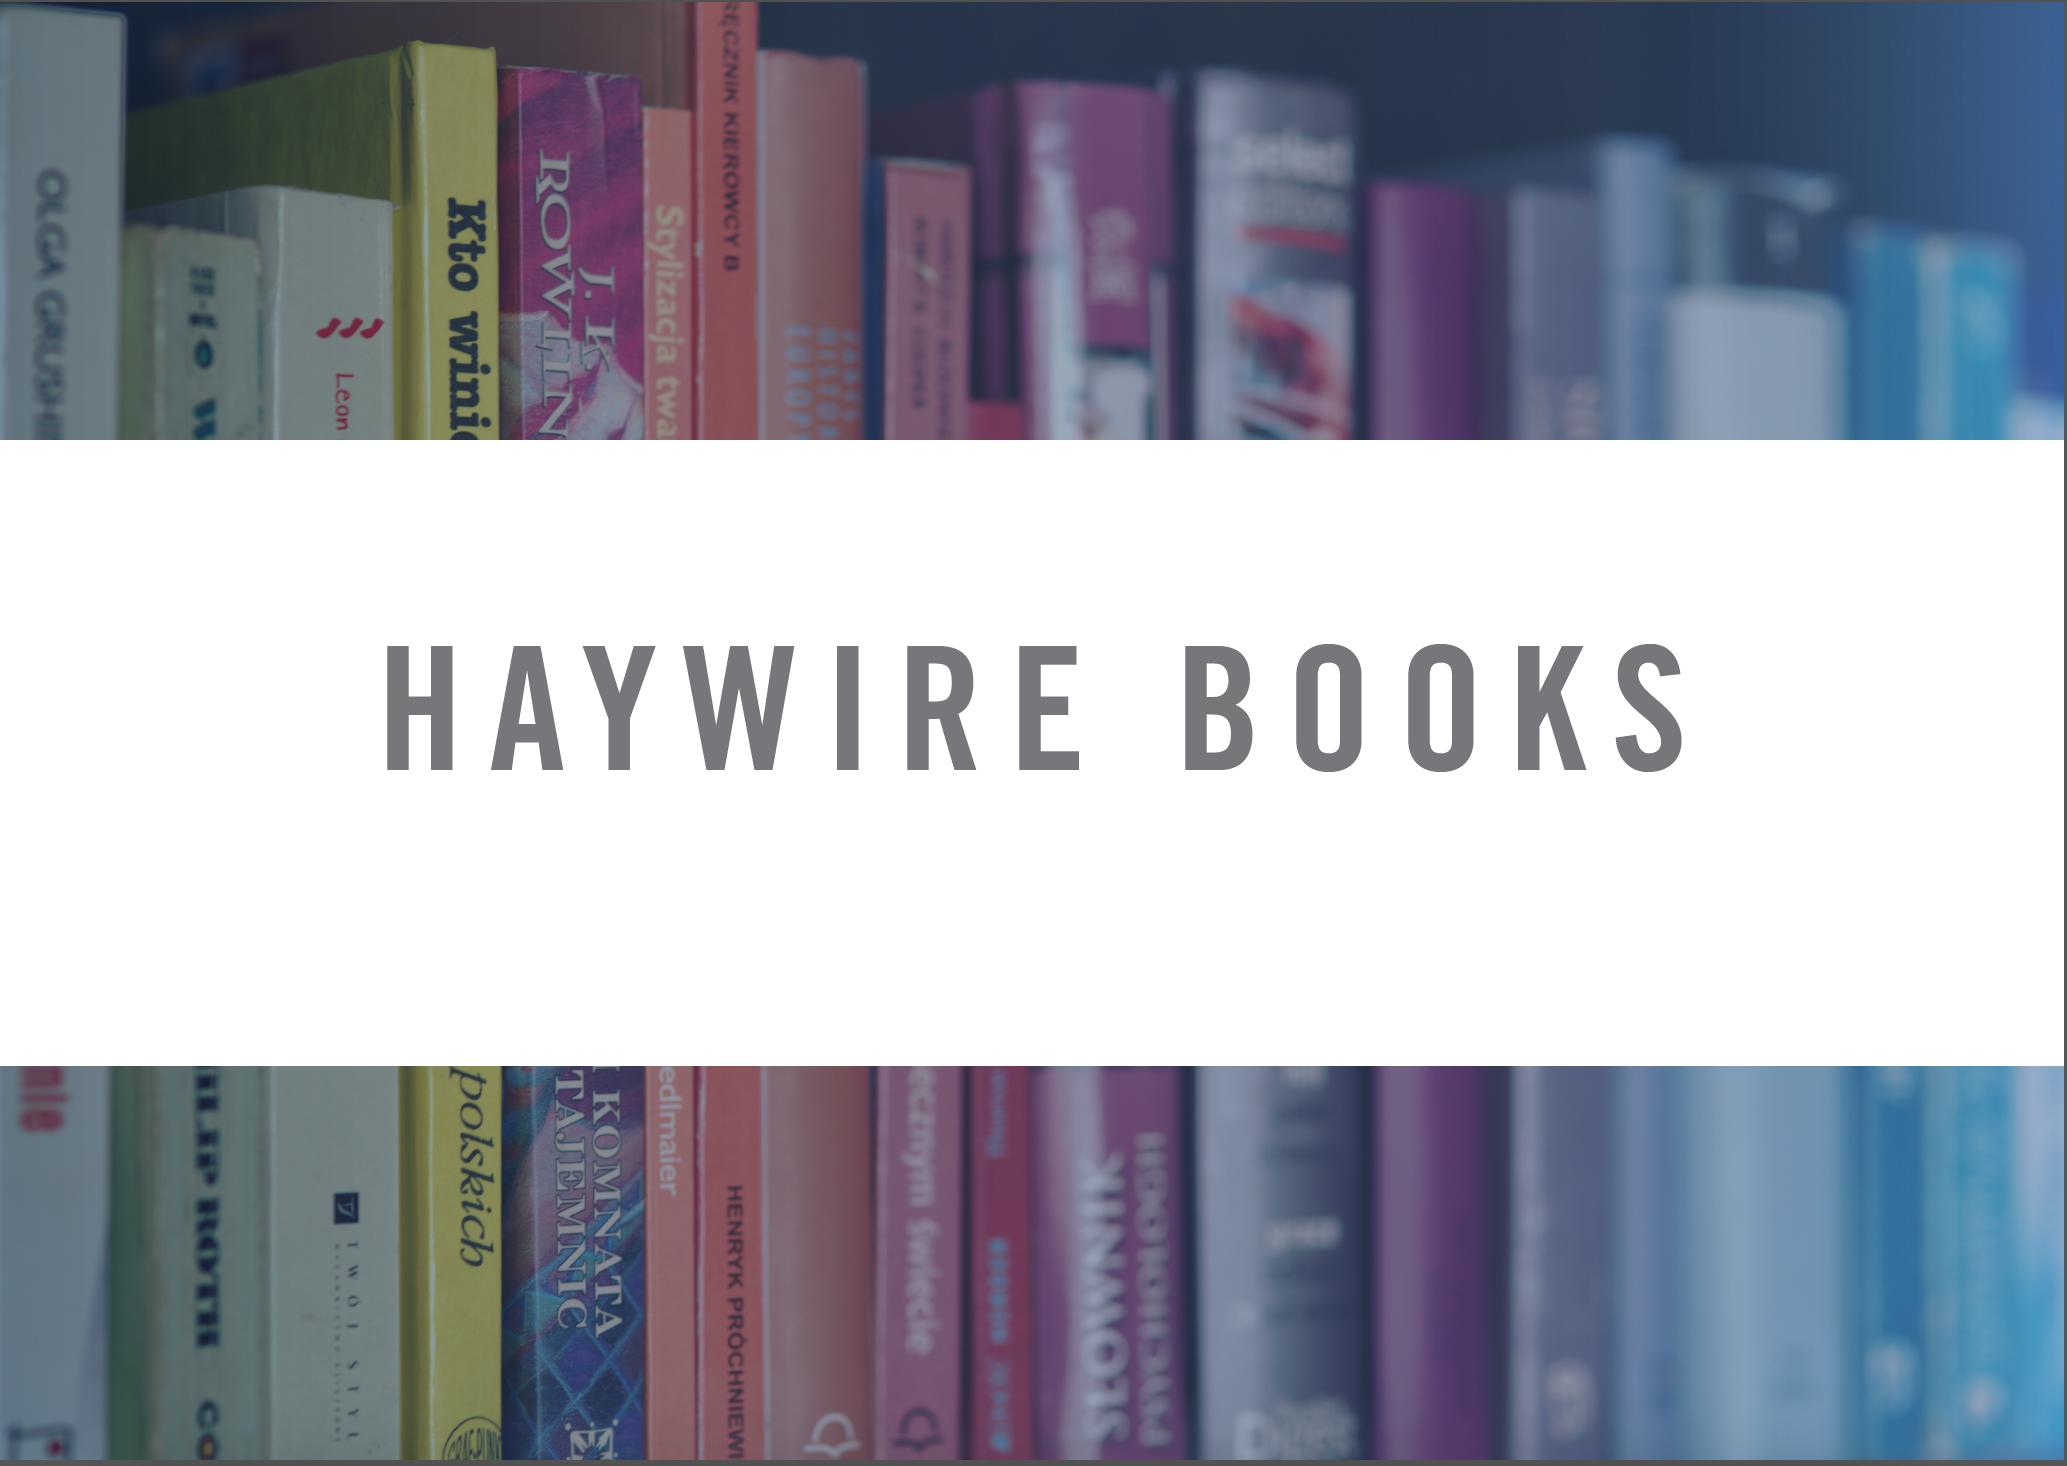 Haywire Books